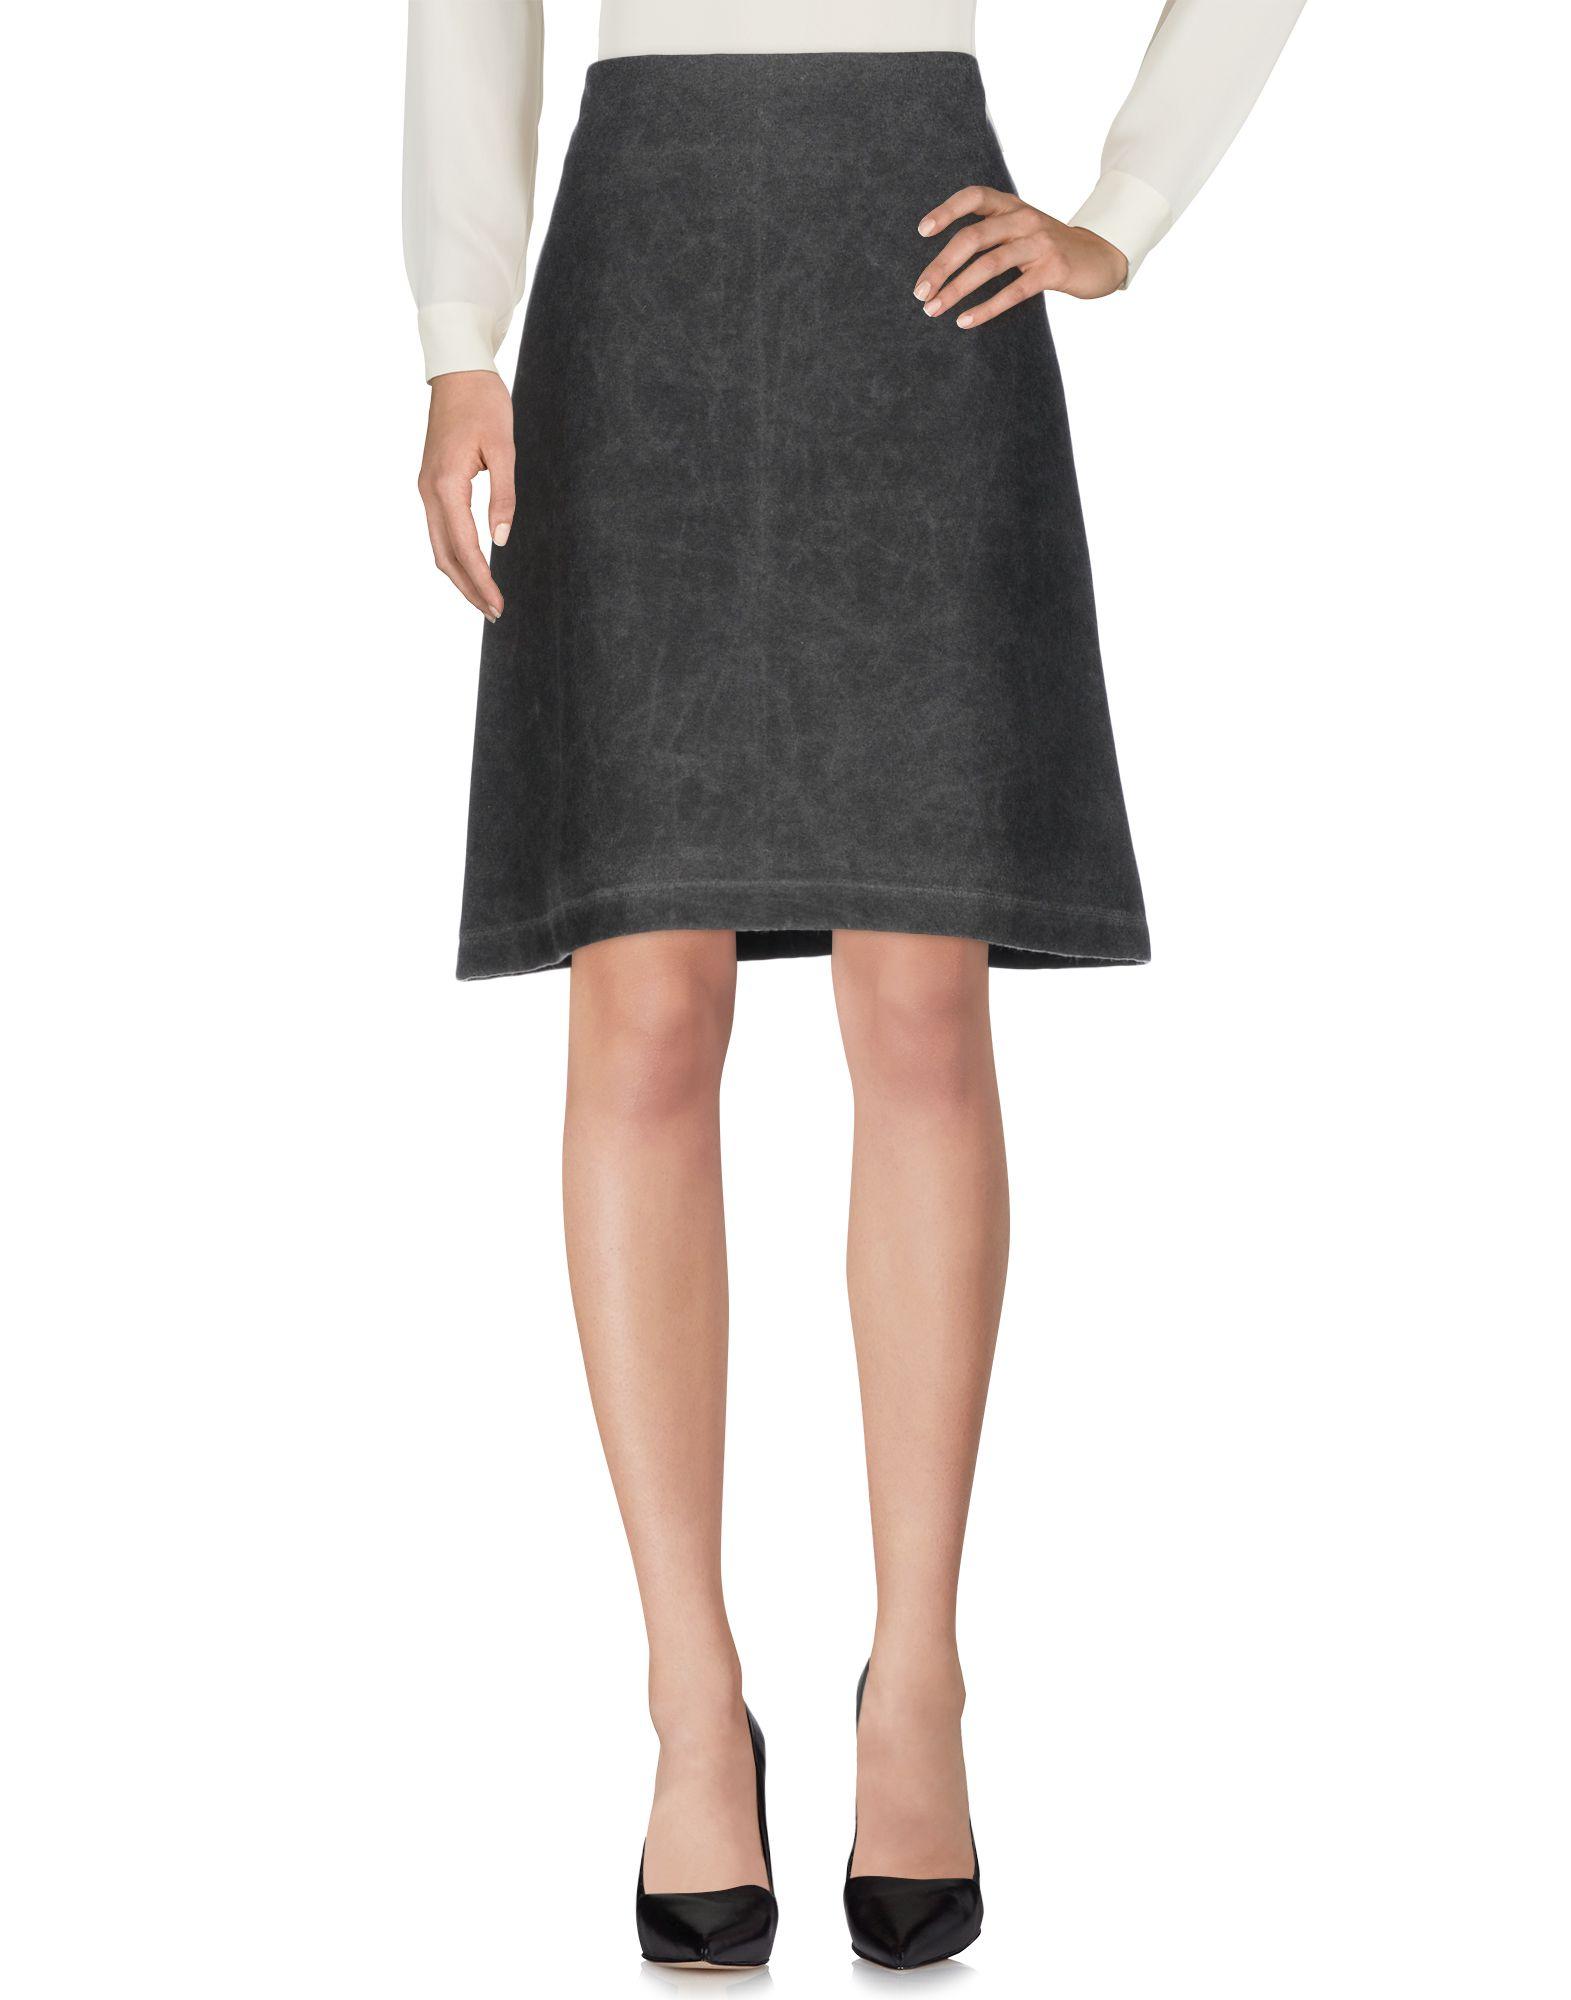 YOSHI KONDO Knee Length Skirt in Lead